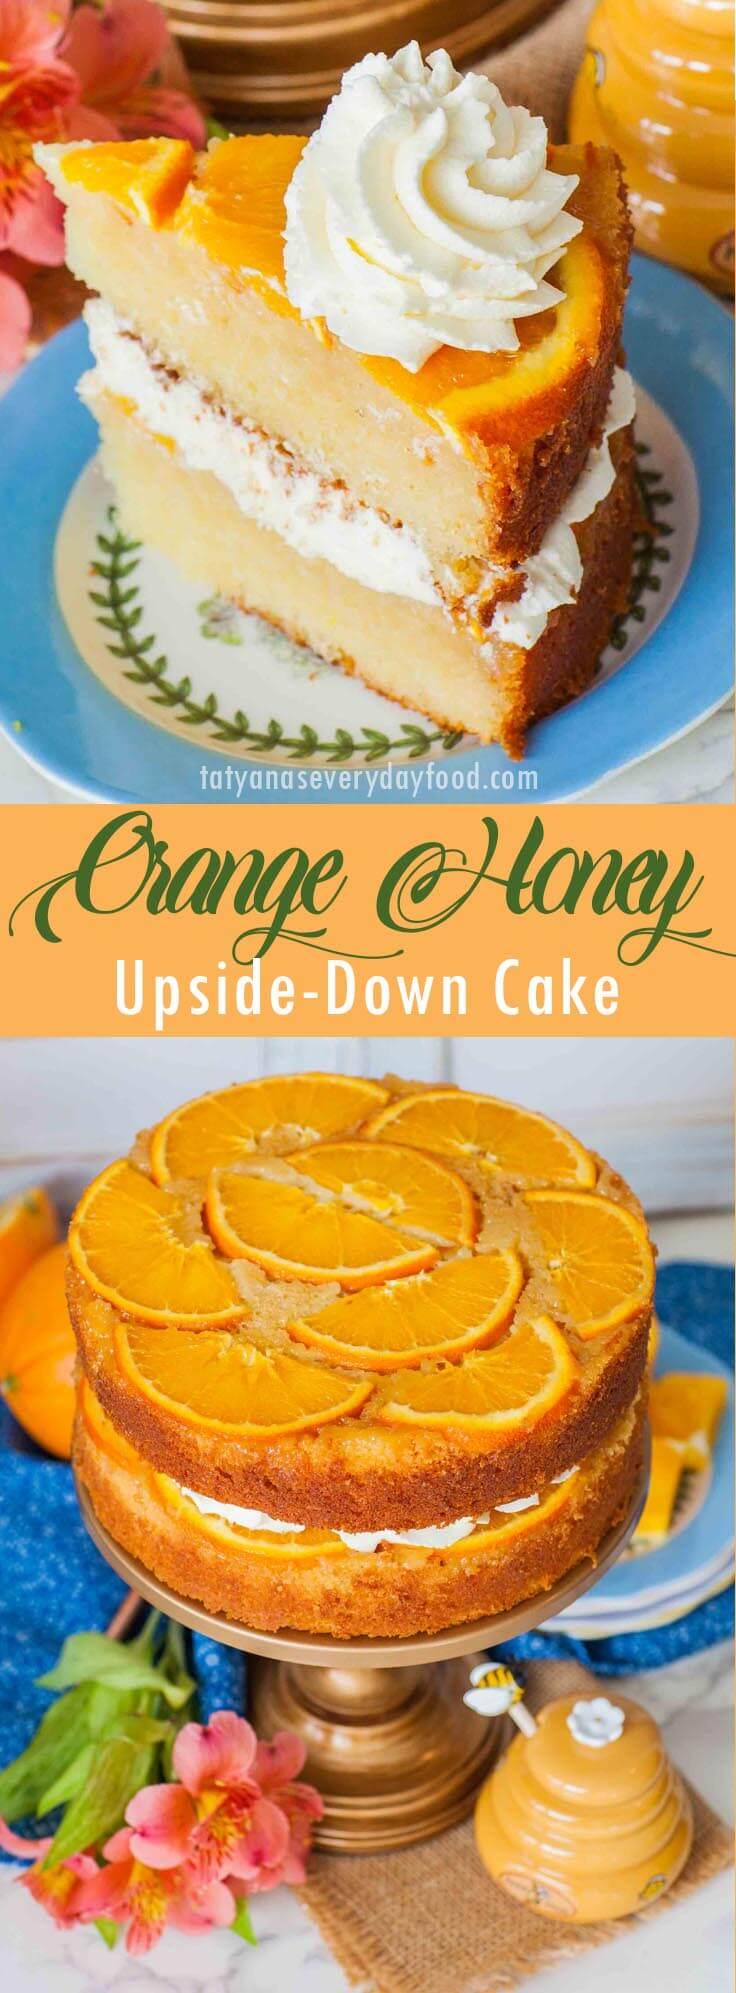 Orange Honey Upside-Down Cake video recipe